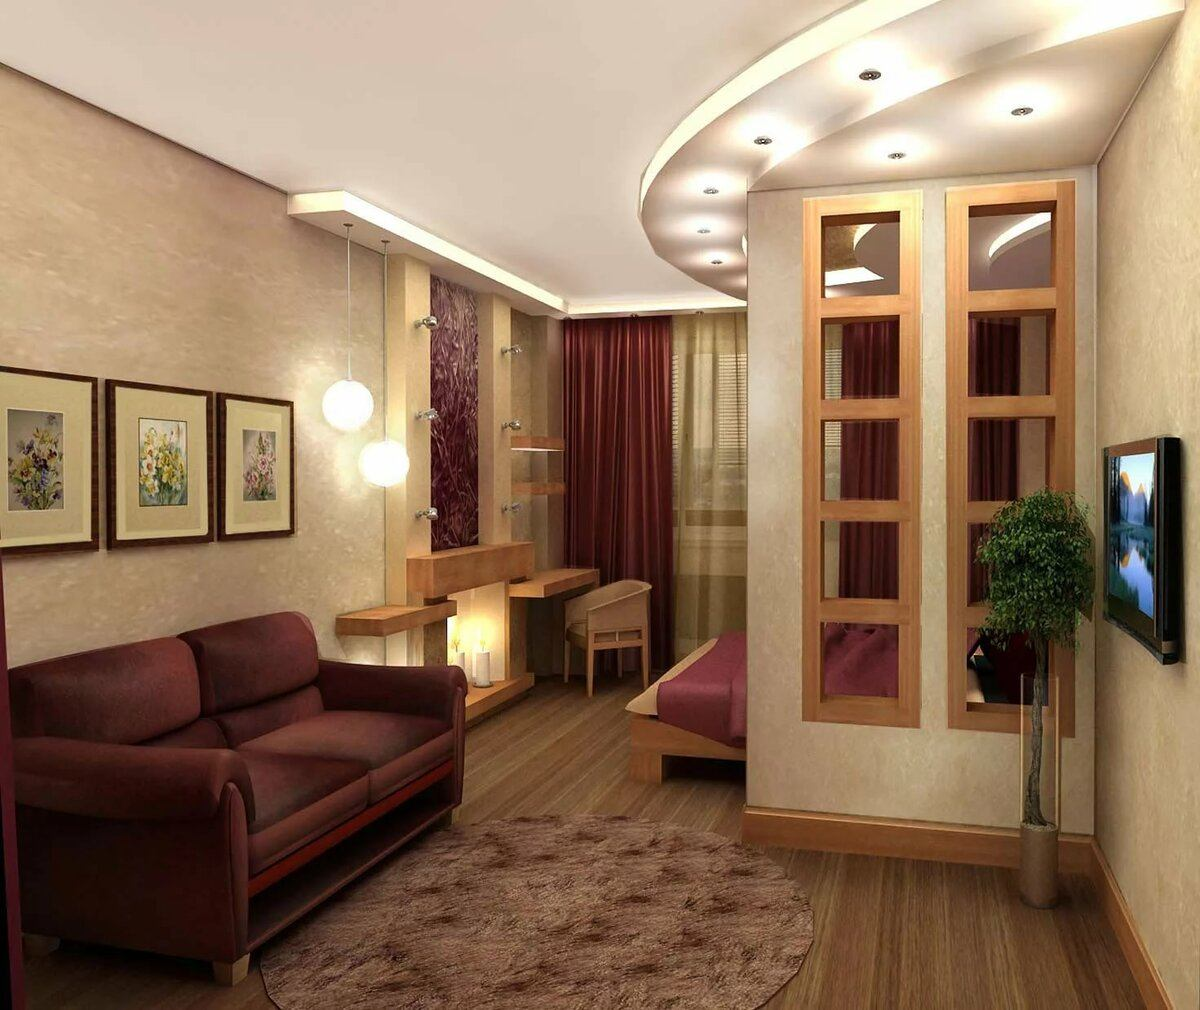 Casual designed living room in dark pastel colors